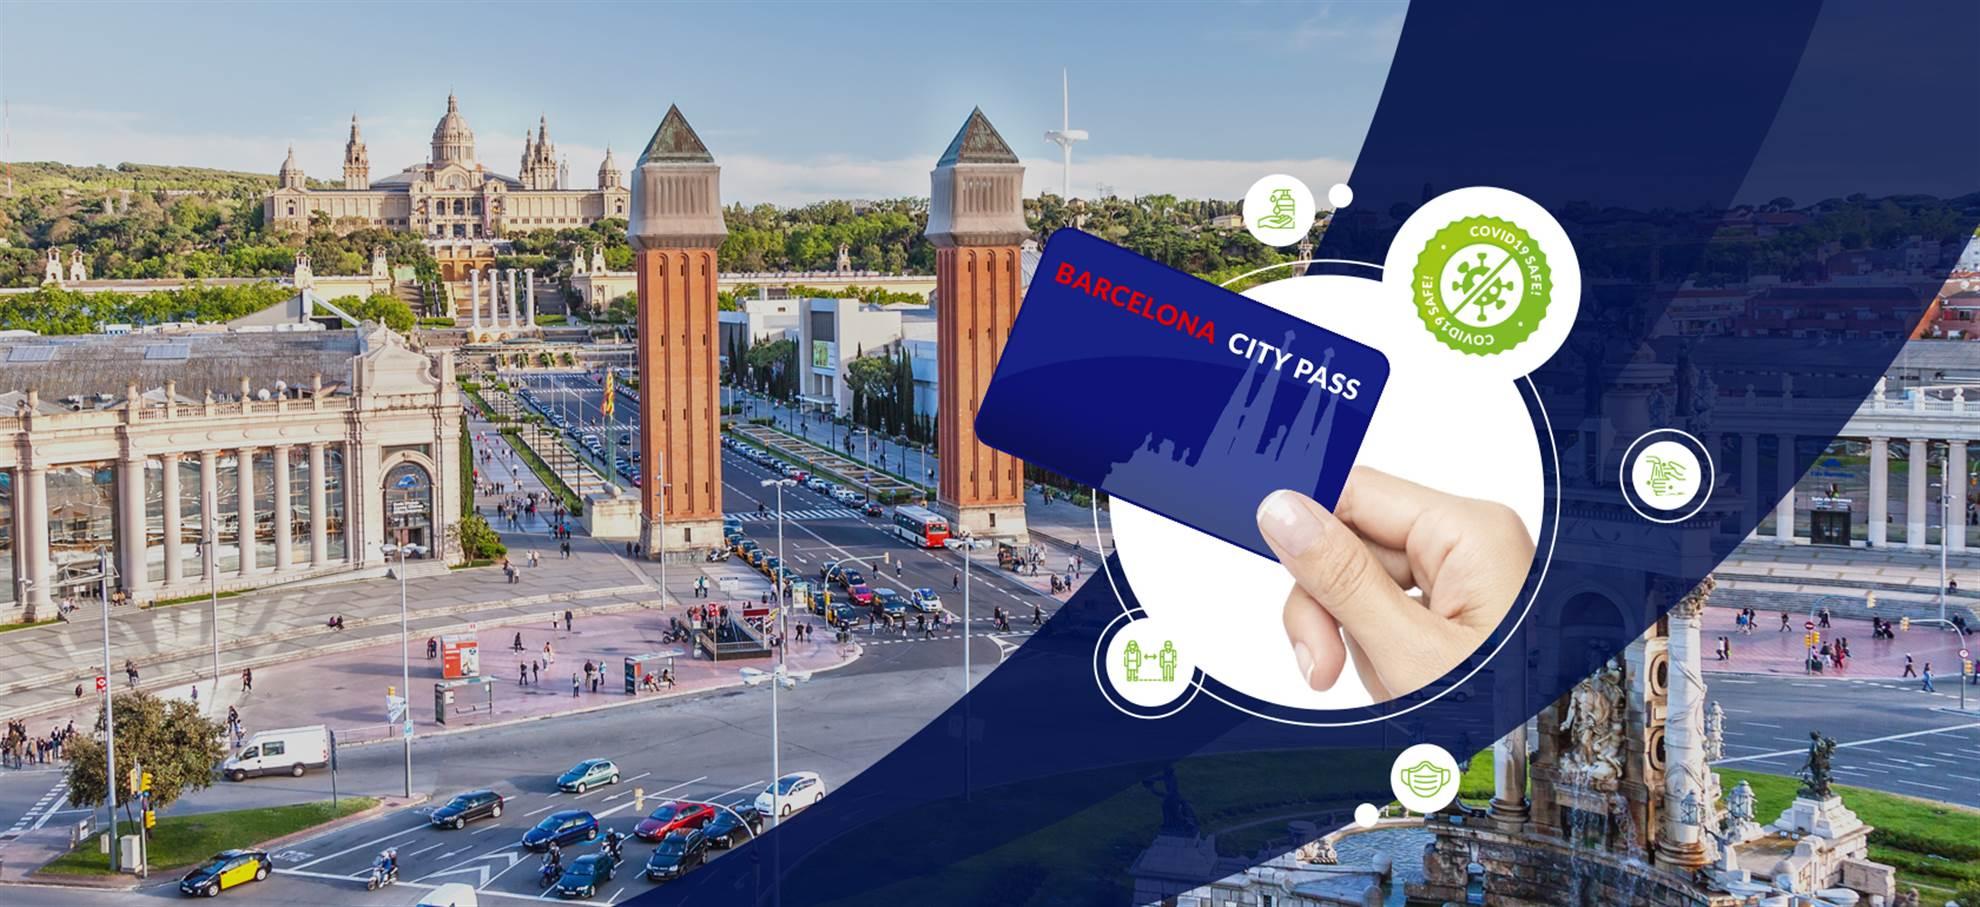 Barcelona City Pass (Corona-sicher)